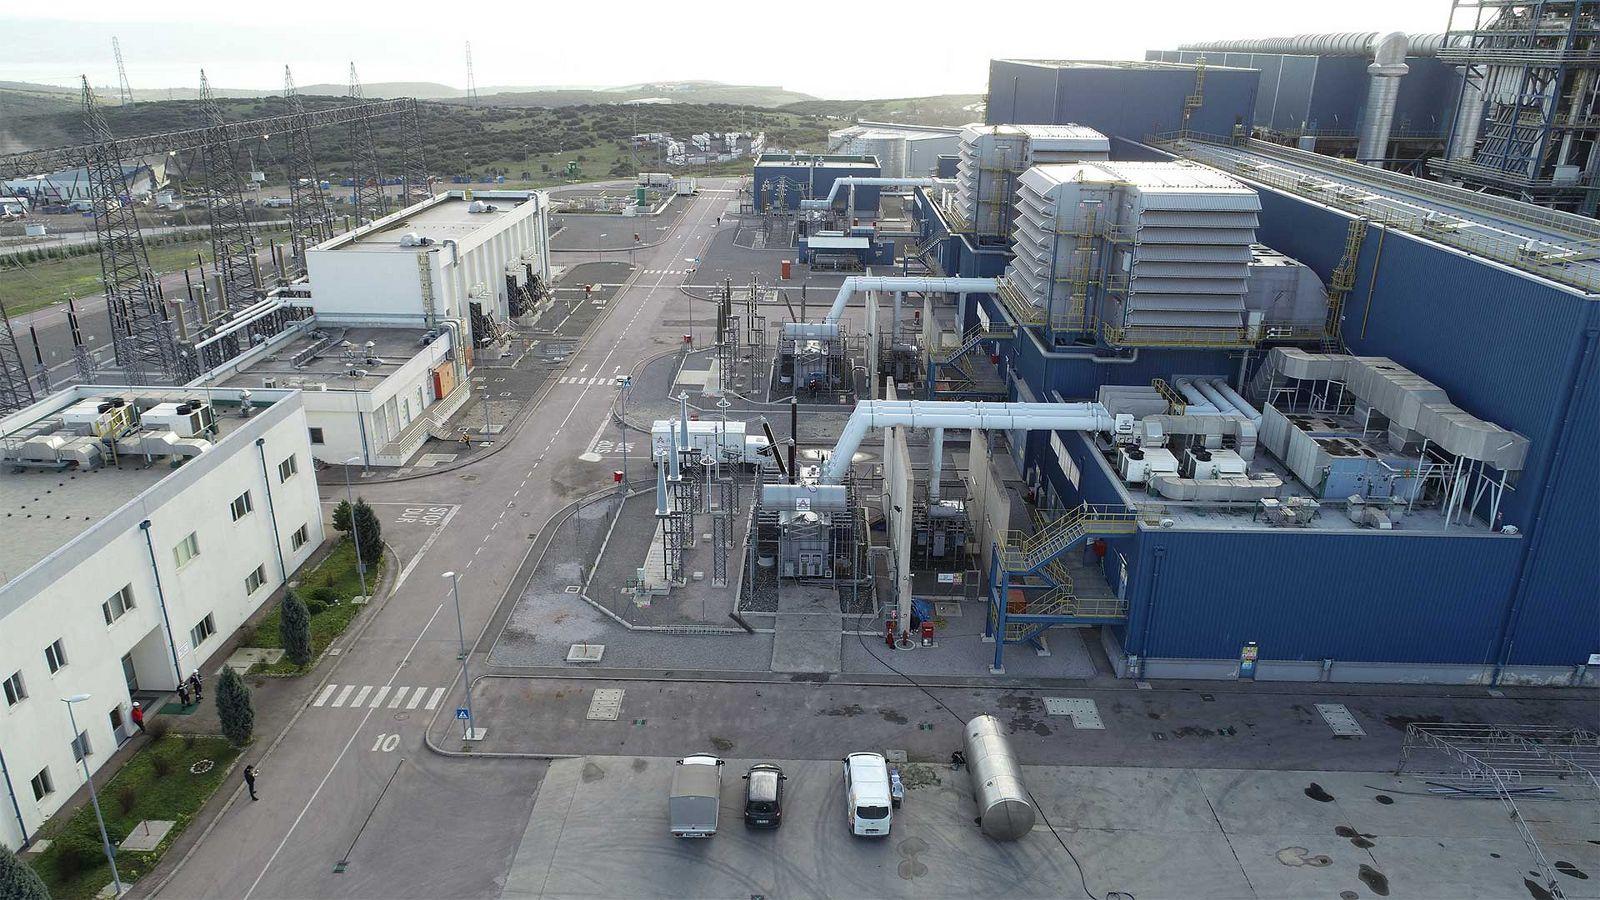 ASTOR %100 Yerli ve Milli 400/18 kV-320 MVA STEP-UP TRANSFORMATÖR